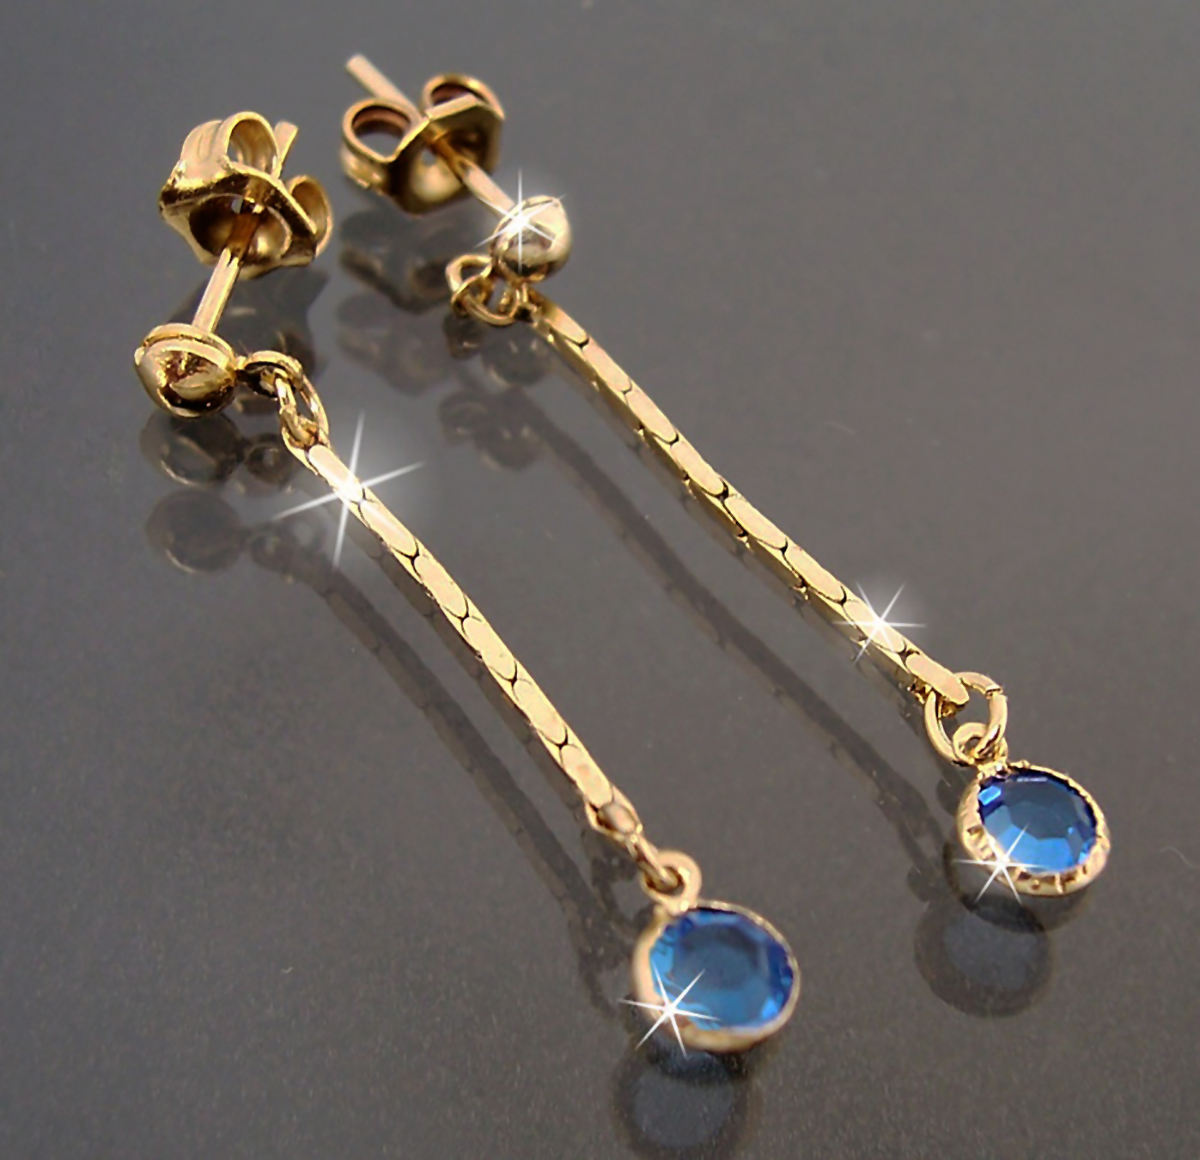 Ohrringe Stecker Ohrhänger 3cm Gold plattiert Zirkonia blau Schmuck O1924